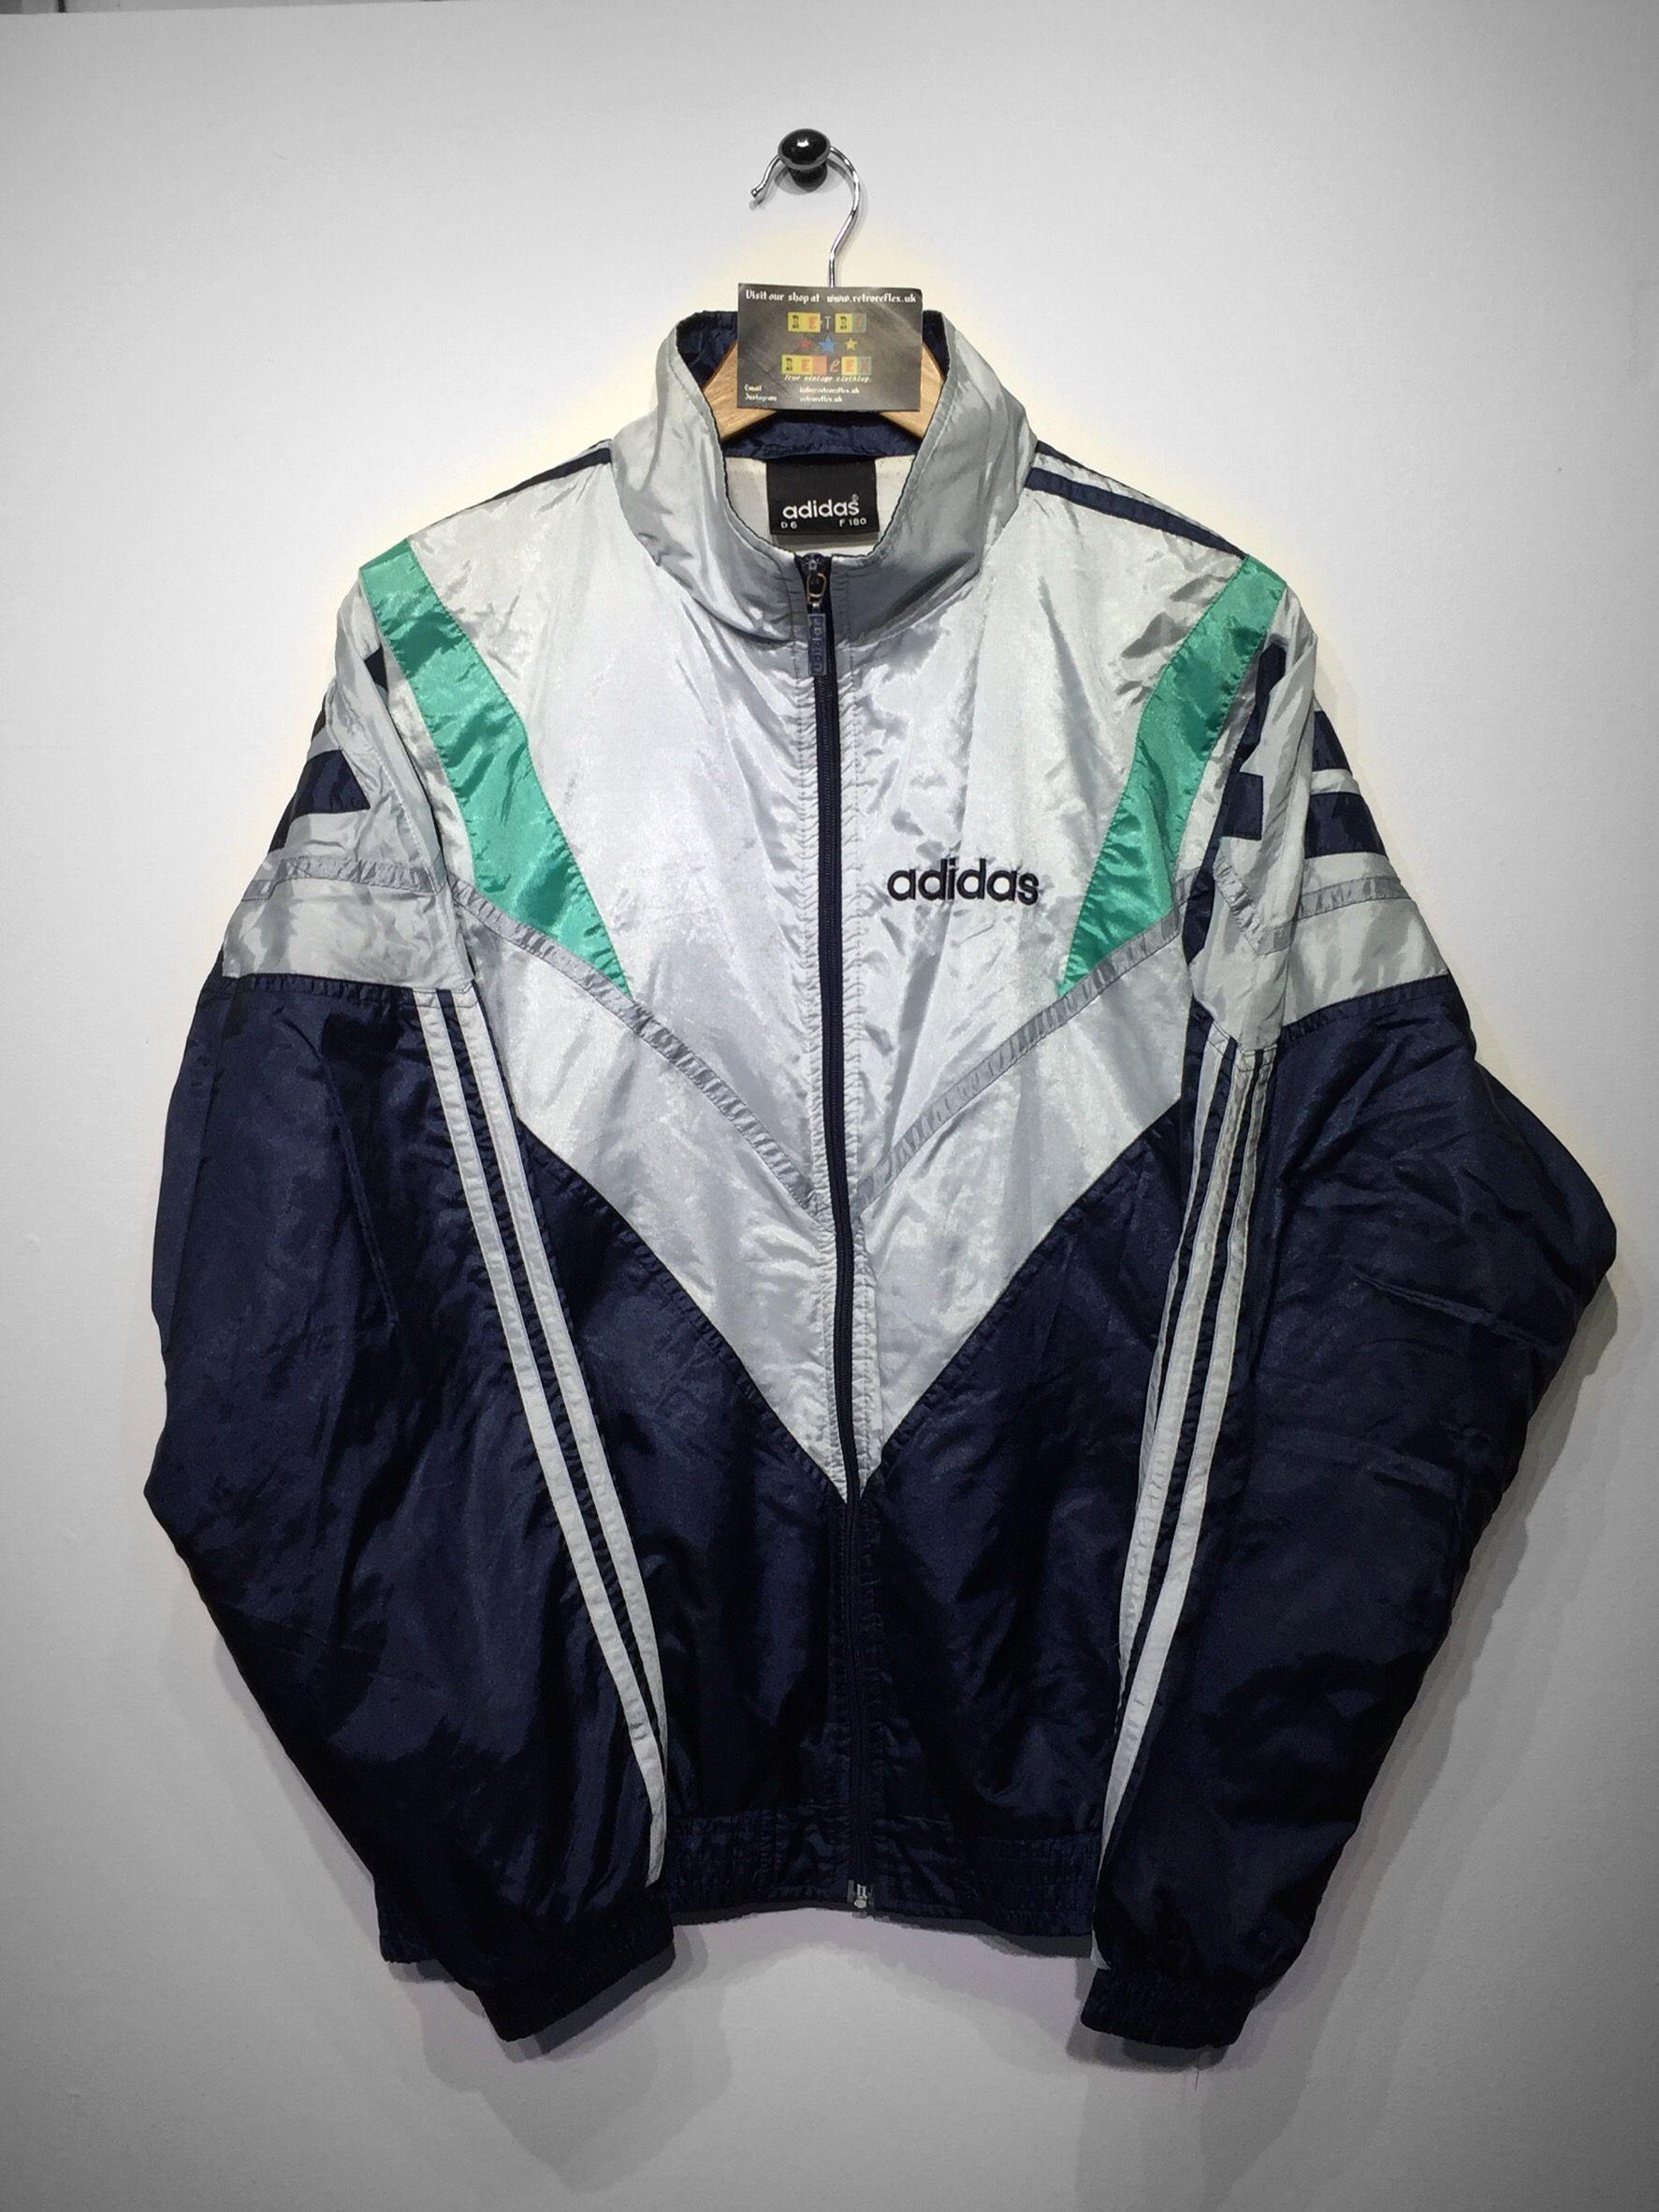 exótico Por qué no Silenciosamente  Adidas Shell jacket size Medium (but Fits Oversized) £32 Website➡️  www.retroreflex.uk #adidas #trefoil #vintage #… | Sportswear fashion,  Clothes, Crossfit clothes